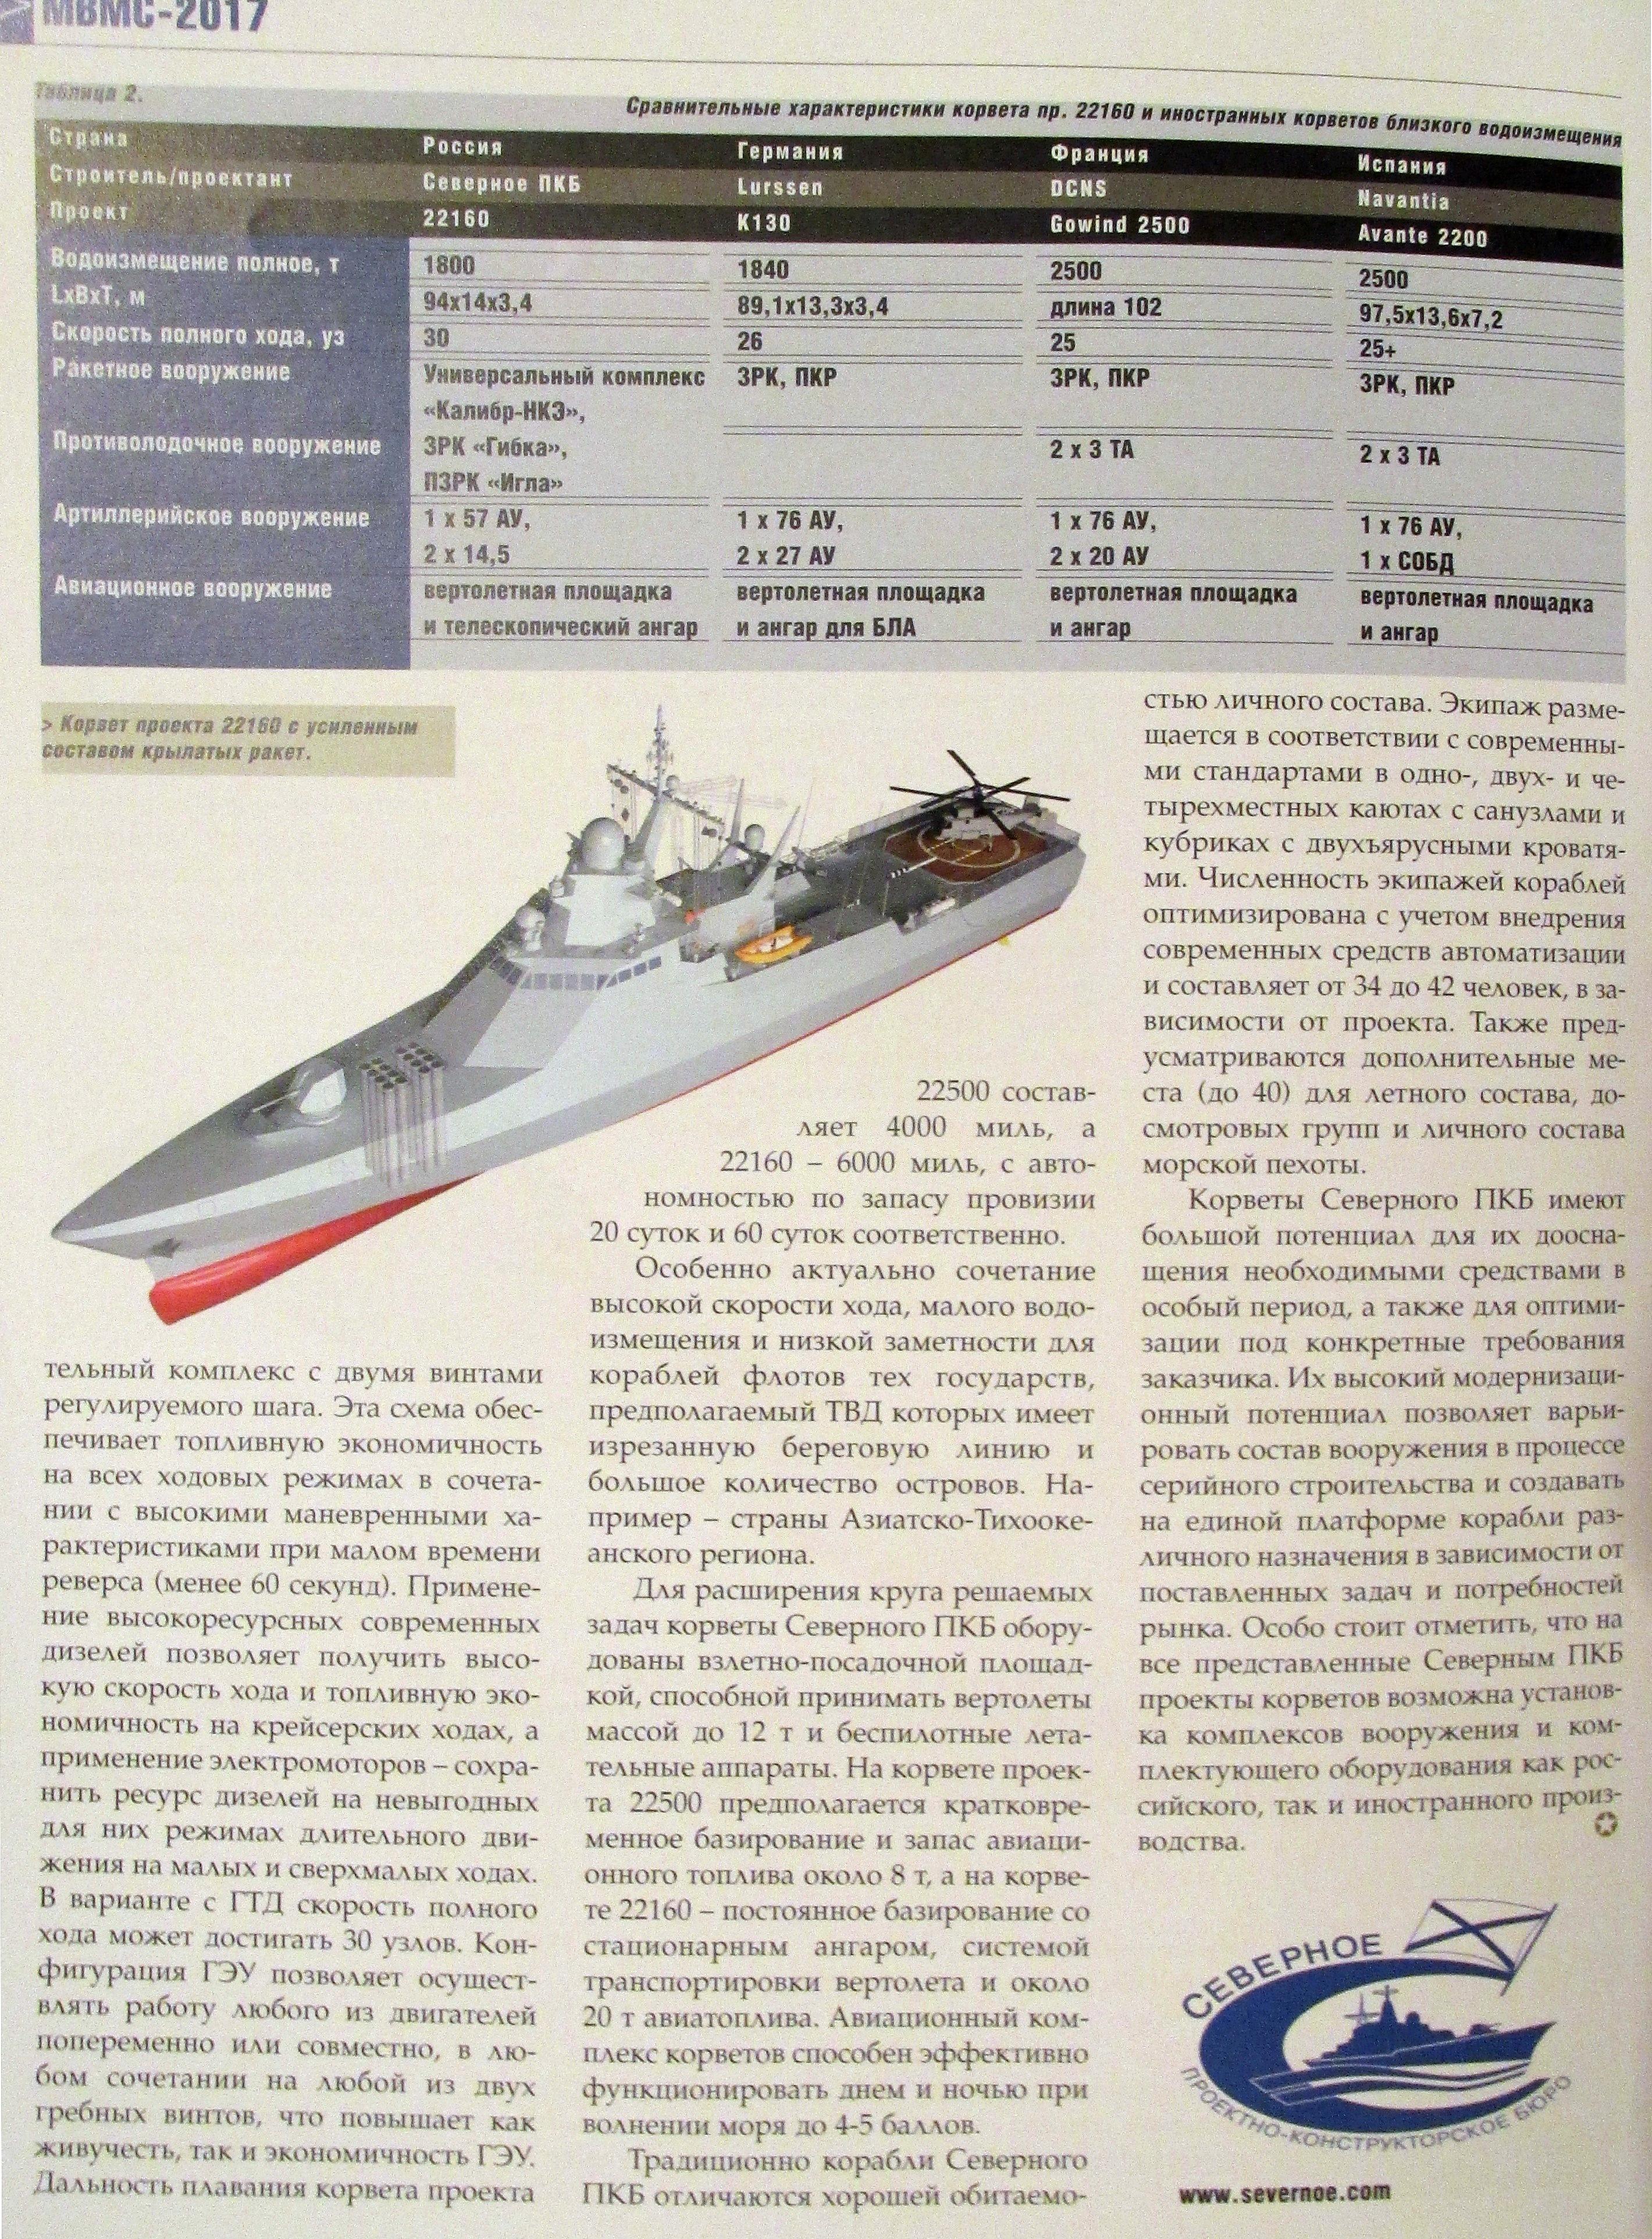 Project 22160 Bykov-class patrol ship - Page 6 30-5141889-korvety-spkb-na-mvms-2017